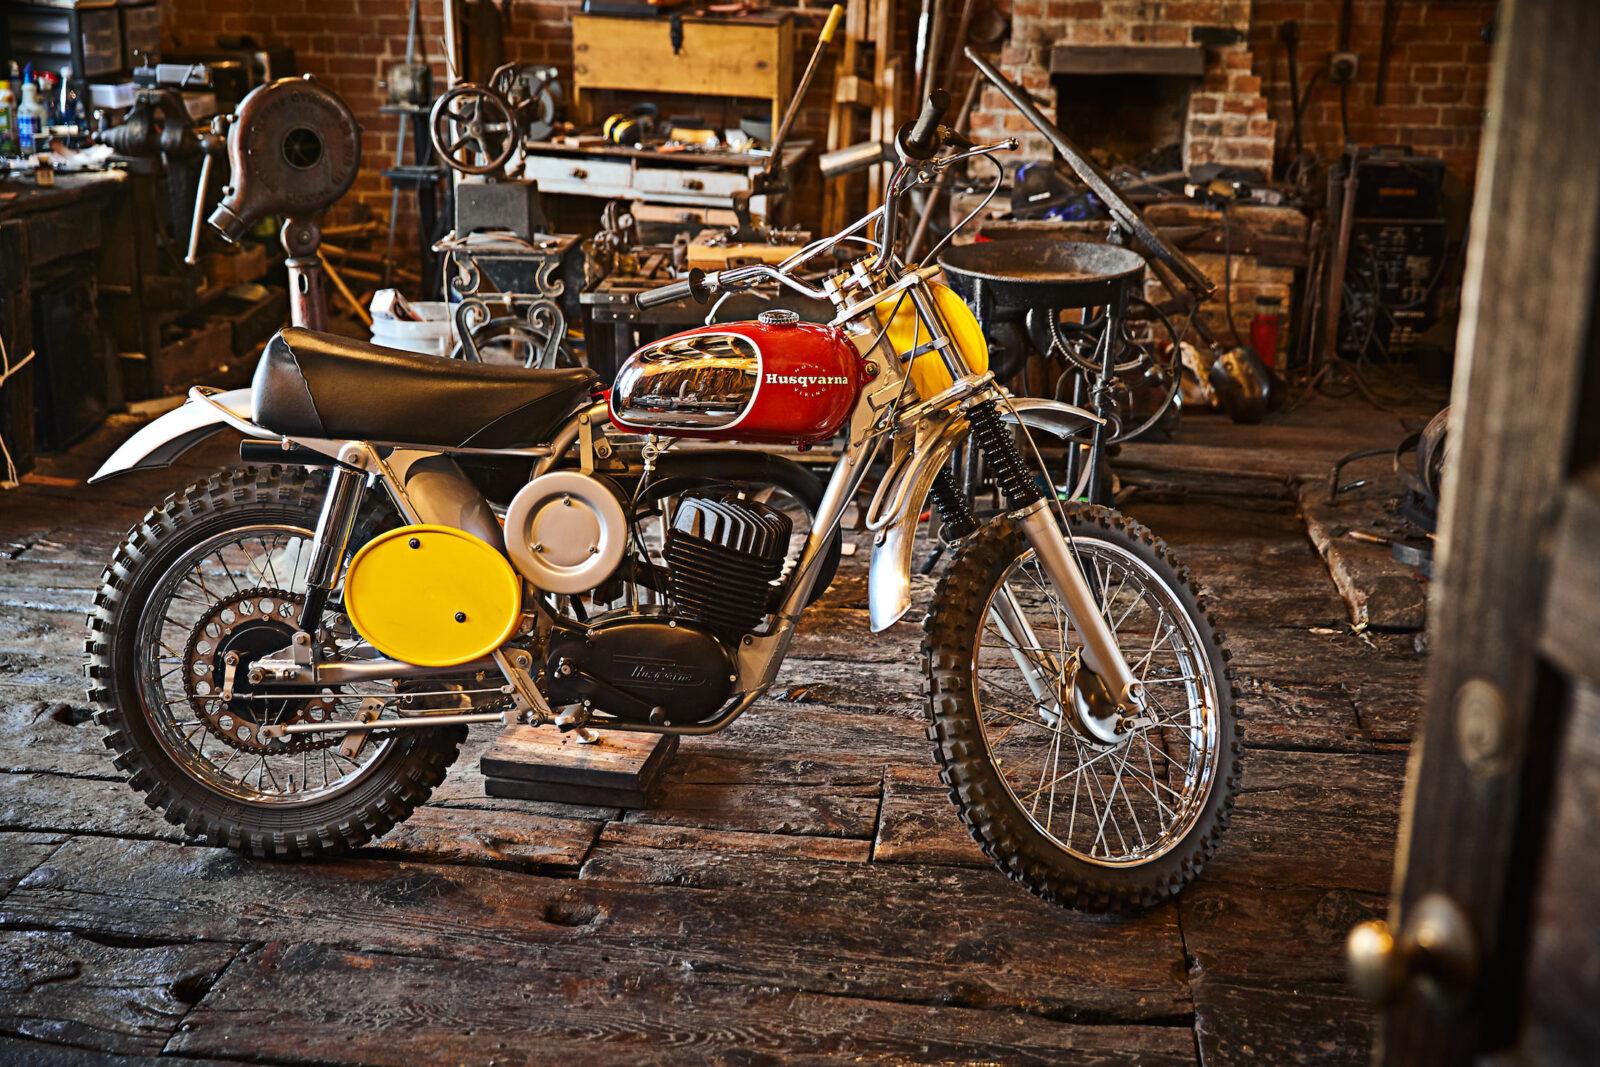 Husqvarna Viking 360cc